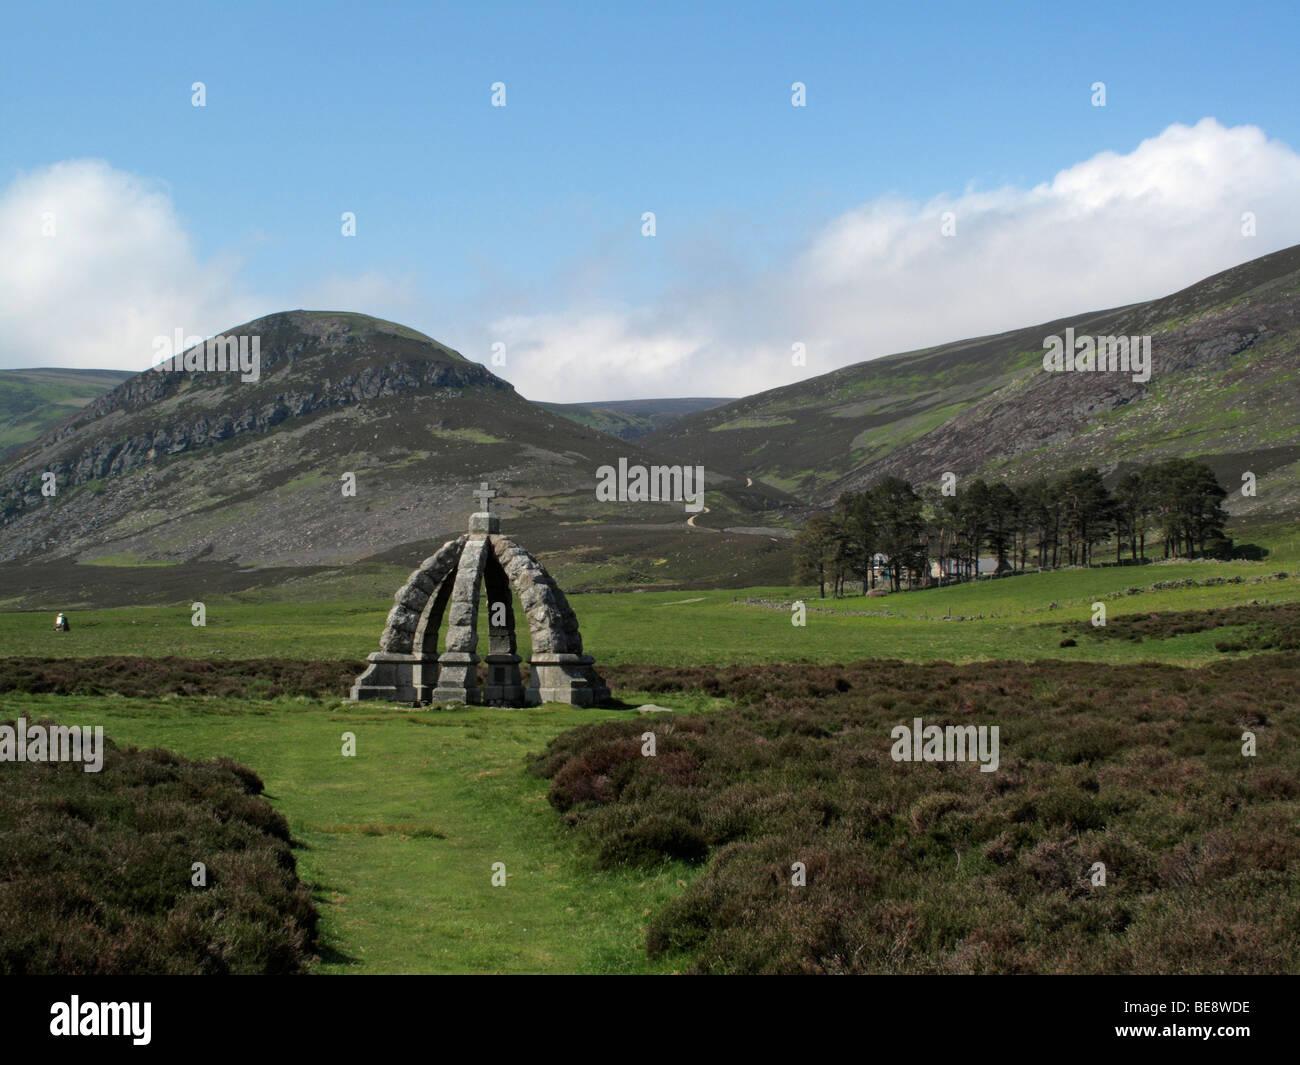 Queen's Well commemorates visit to Glenmark by Queen Victoria - Stock Image